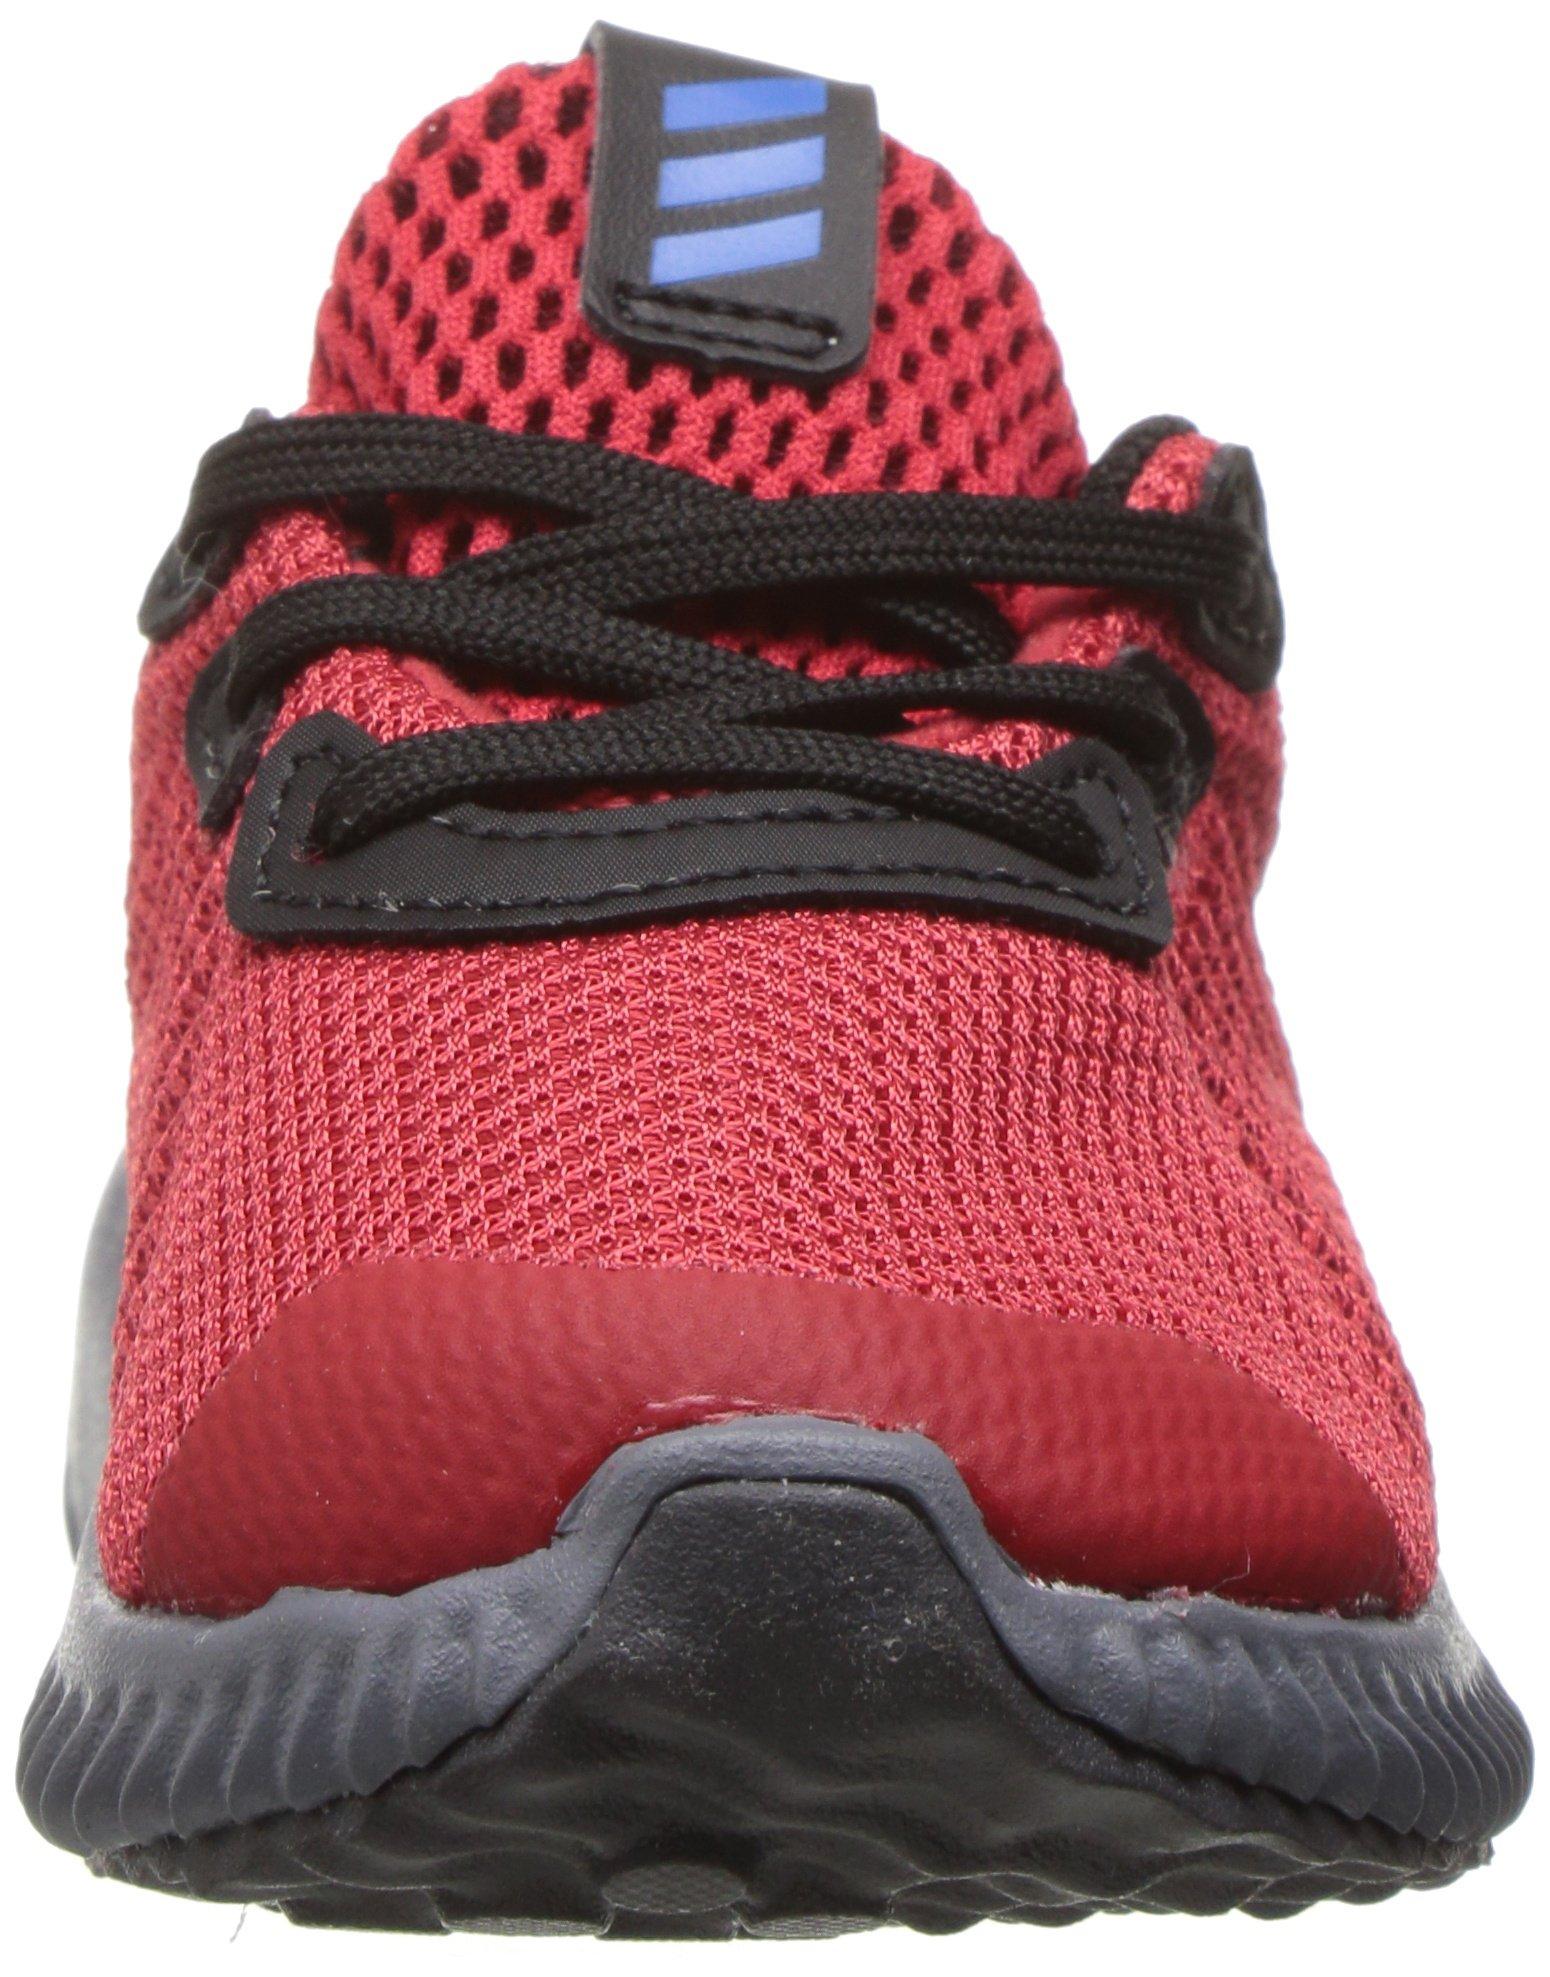 adidas Kids' Alphabounce Sneaker, Scarlet/Satellite/Black, 8 M US Toddler by adidas (Image #4)